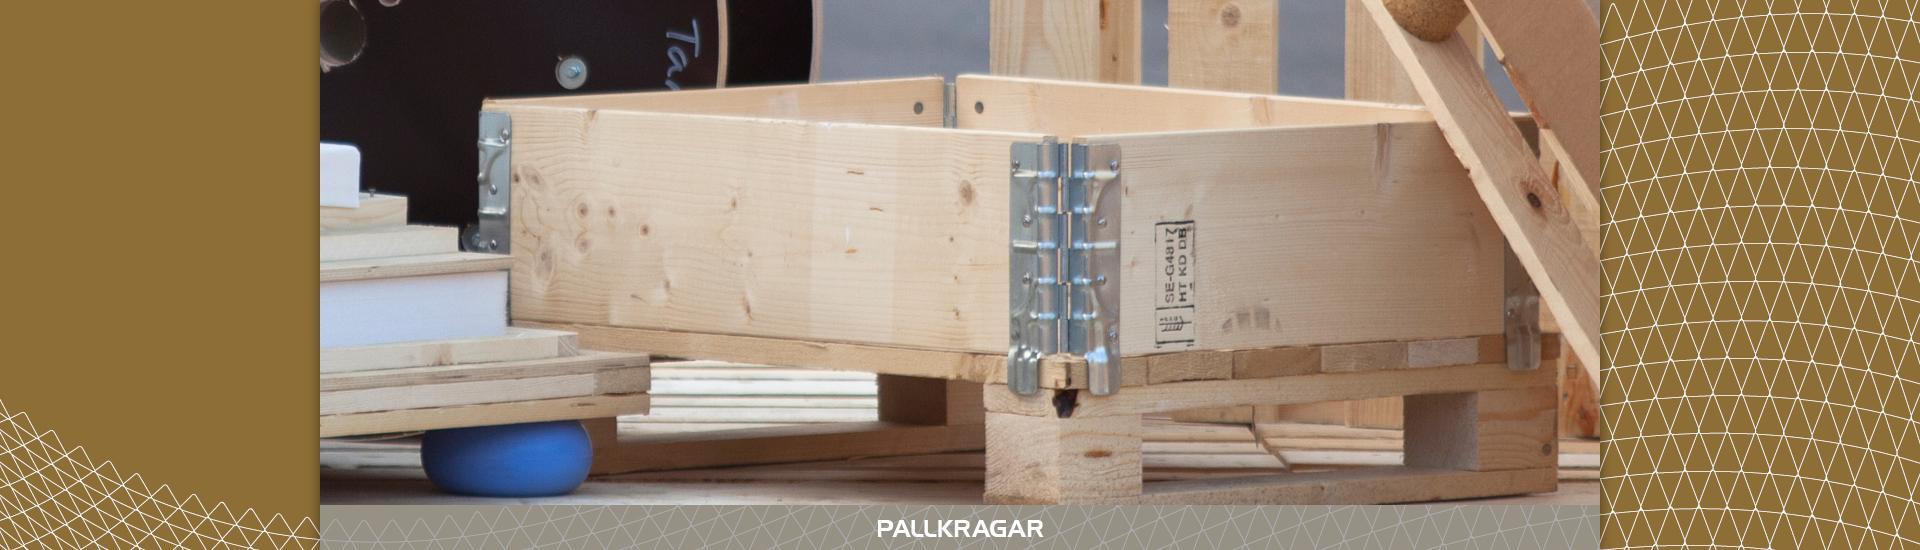 PallKragar01